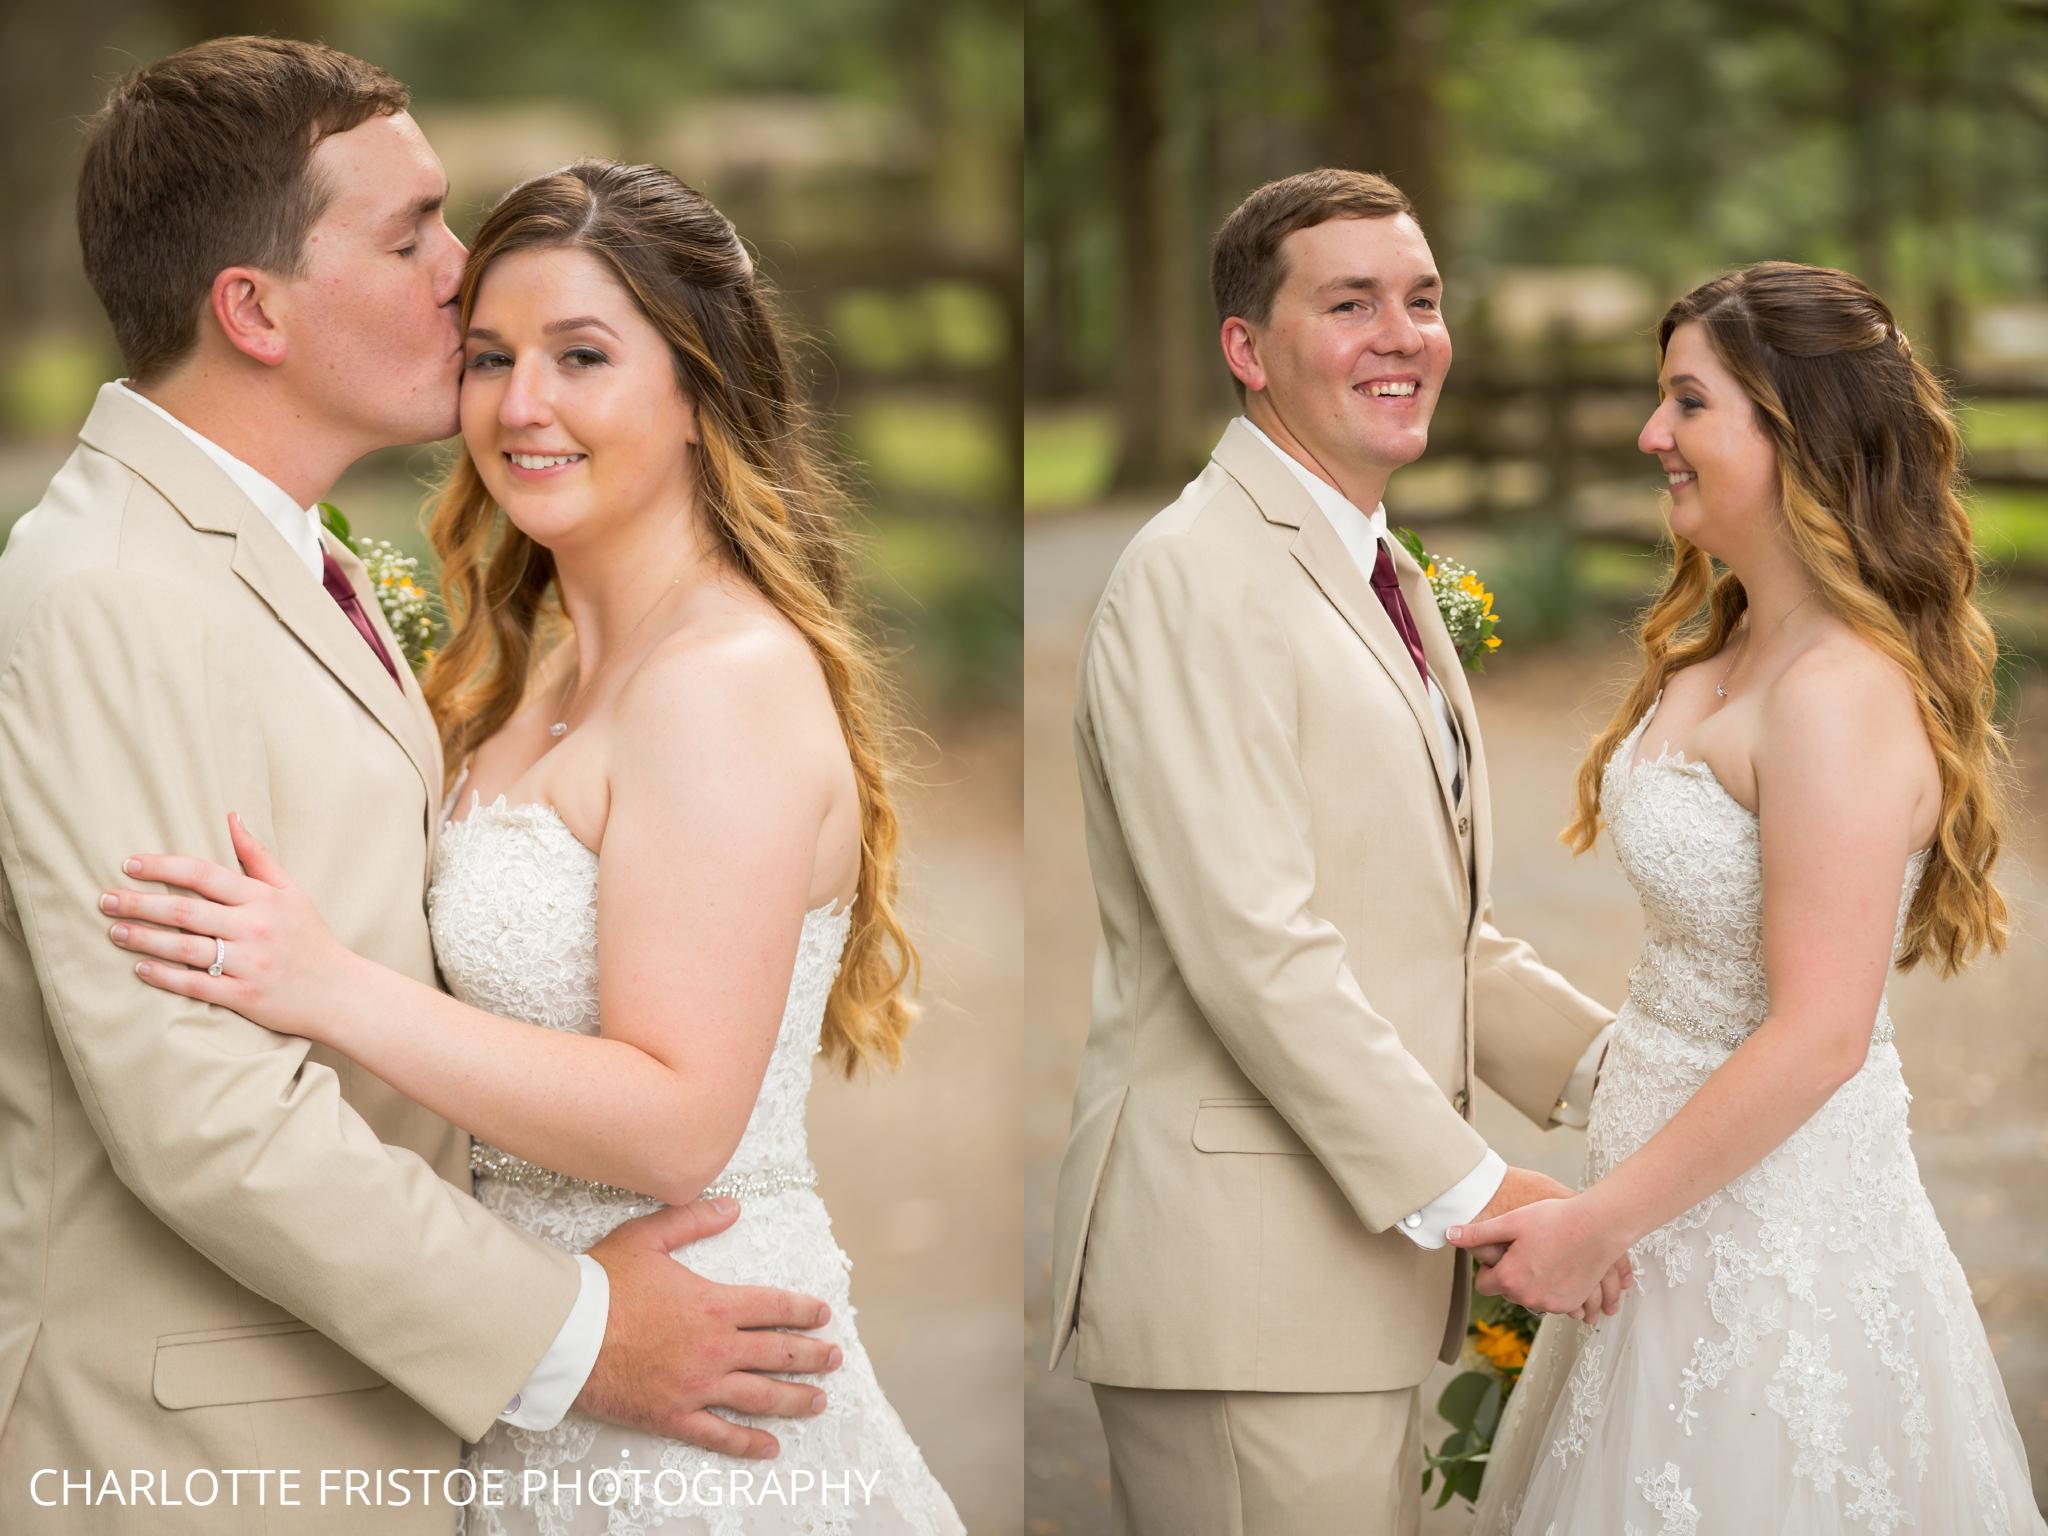 Tallahassee_Wedding_Charlotte_Fristoe-56.jpg